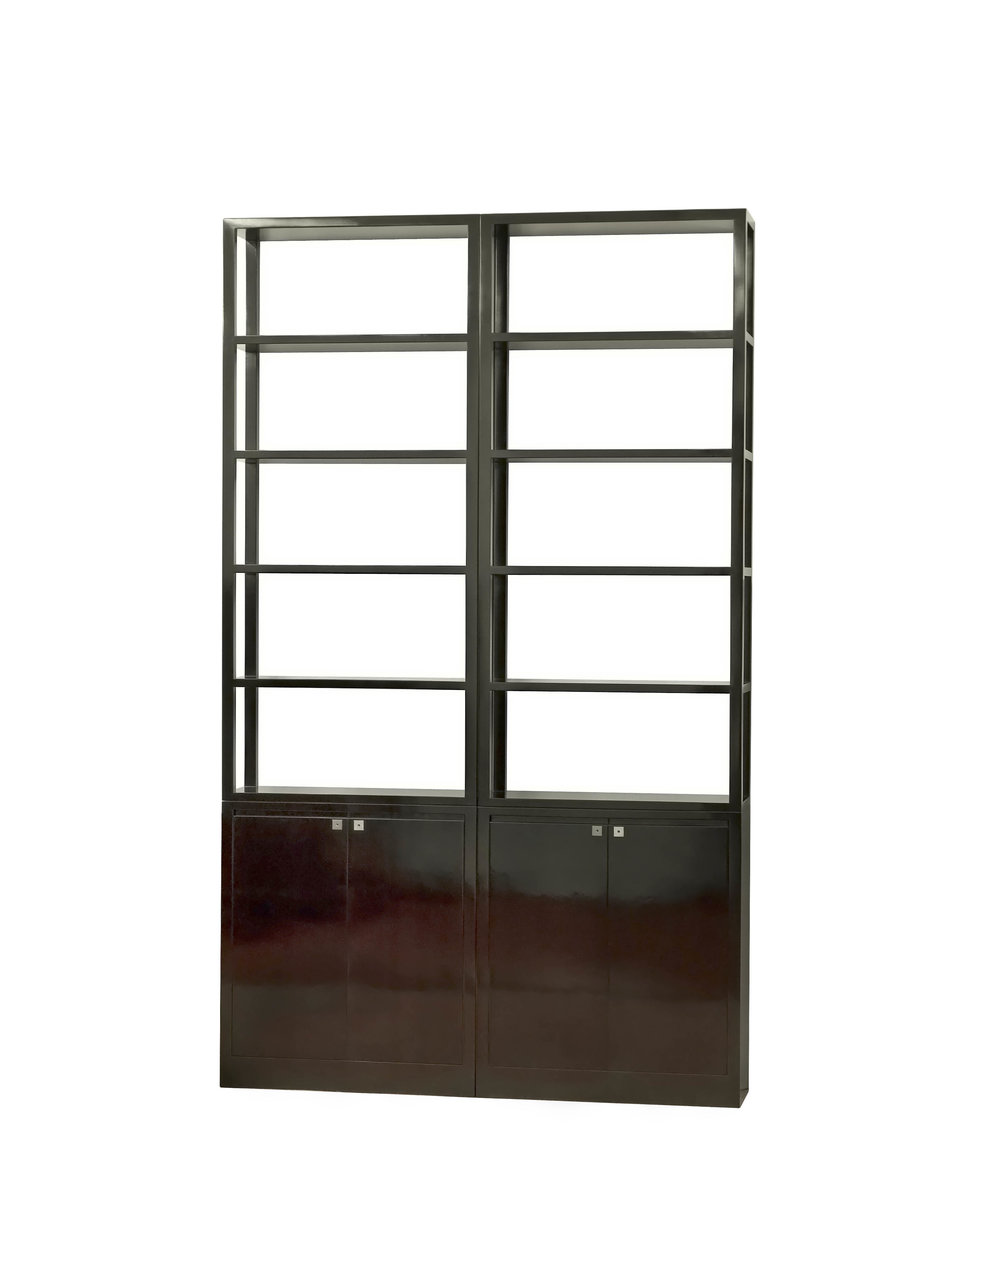 .modern furniture : compound bookshelf..摩登家具 : 组合书架....